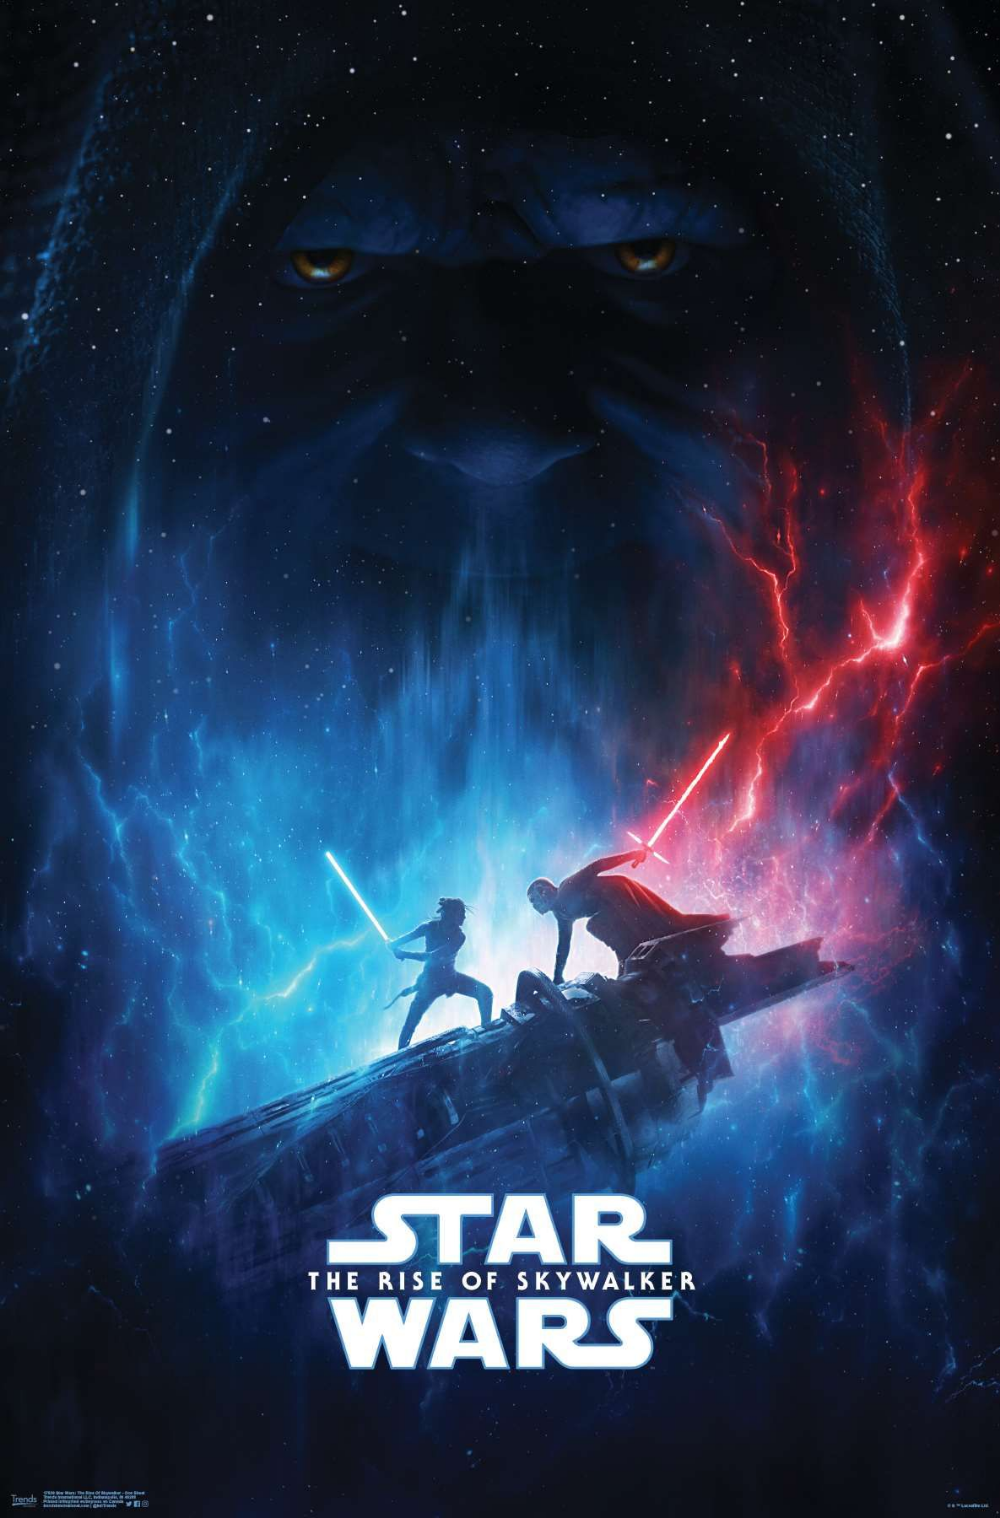 Star Wars The Rise Of Skywalker Officially Licensed One Sheet Star Wars Watch Star Wars Episodes Star Wars Poster